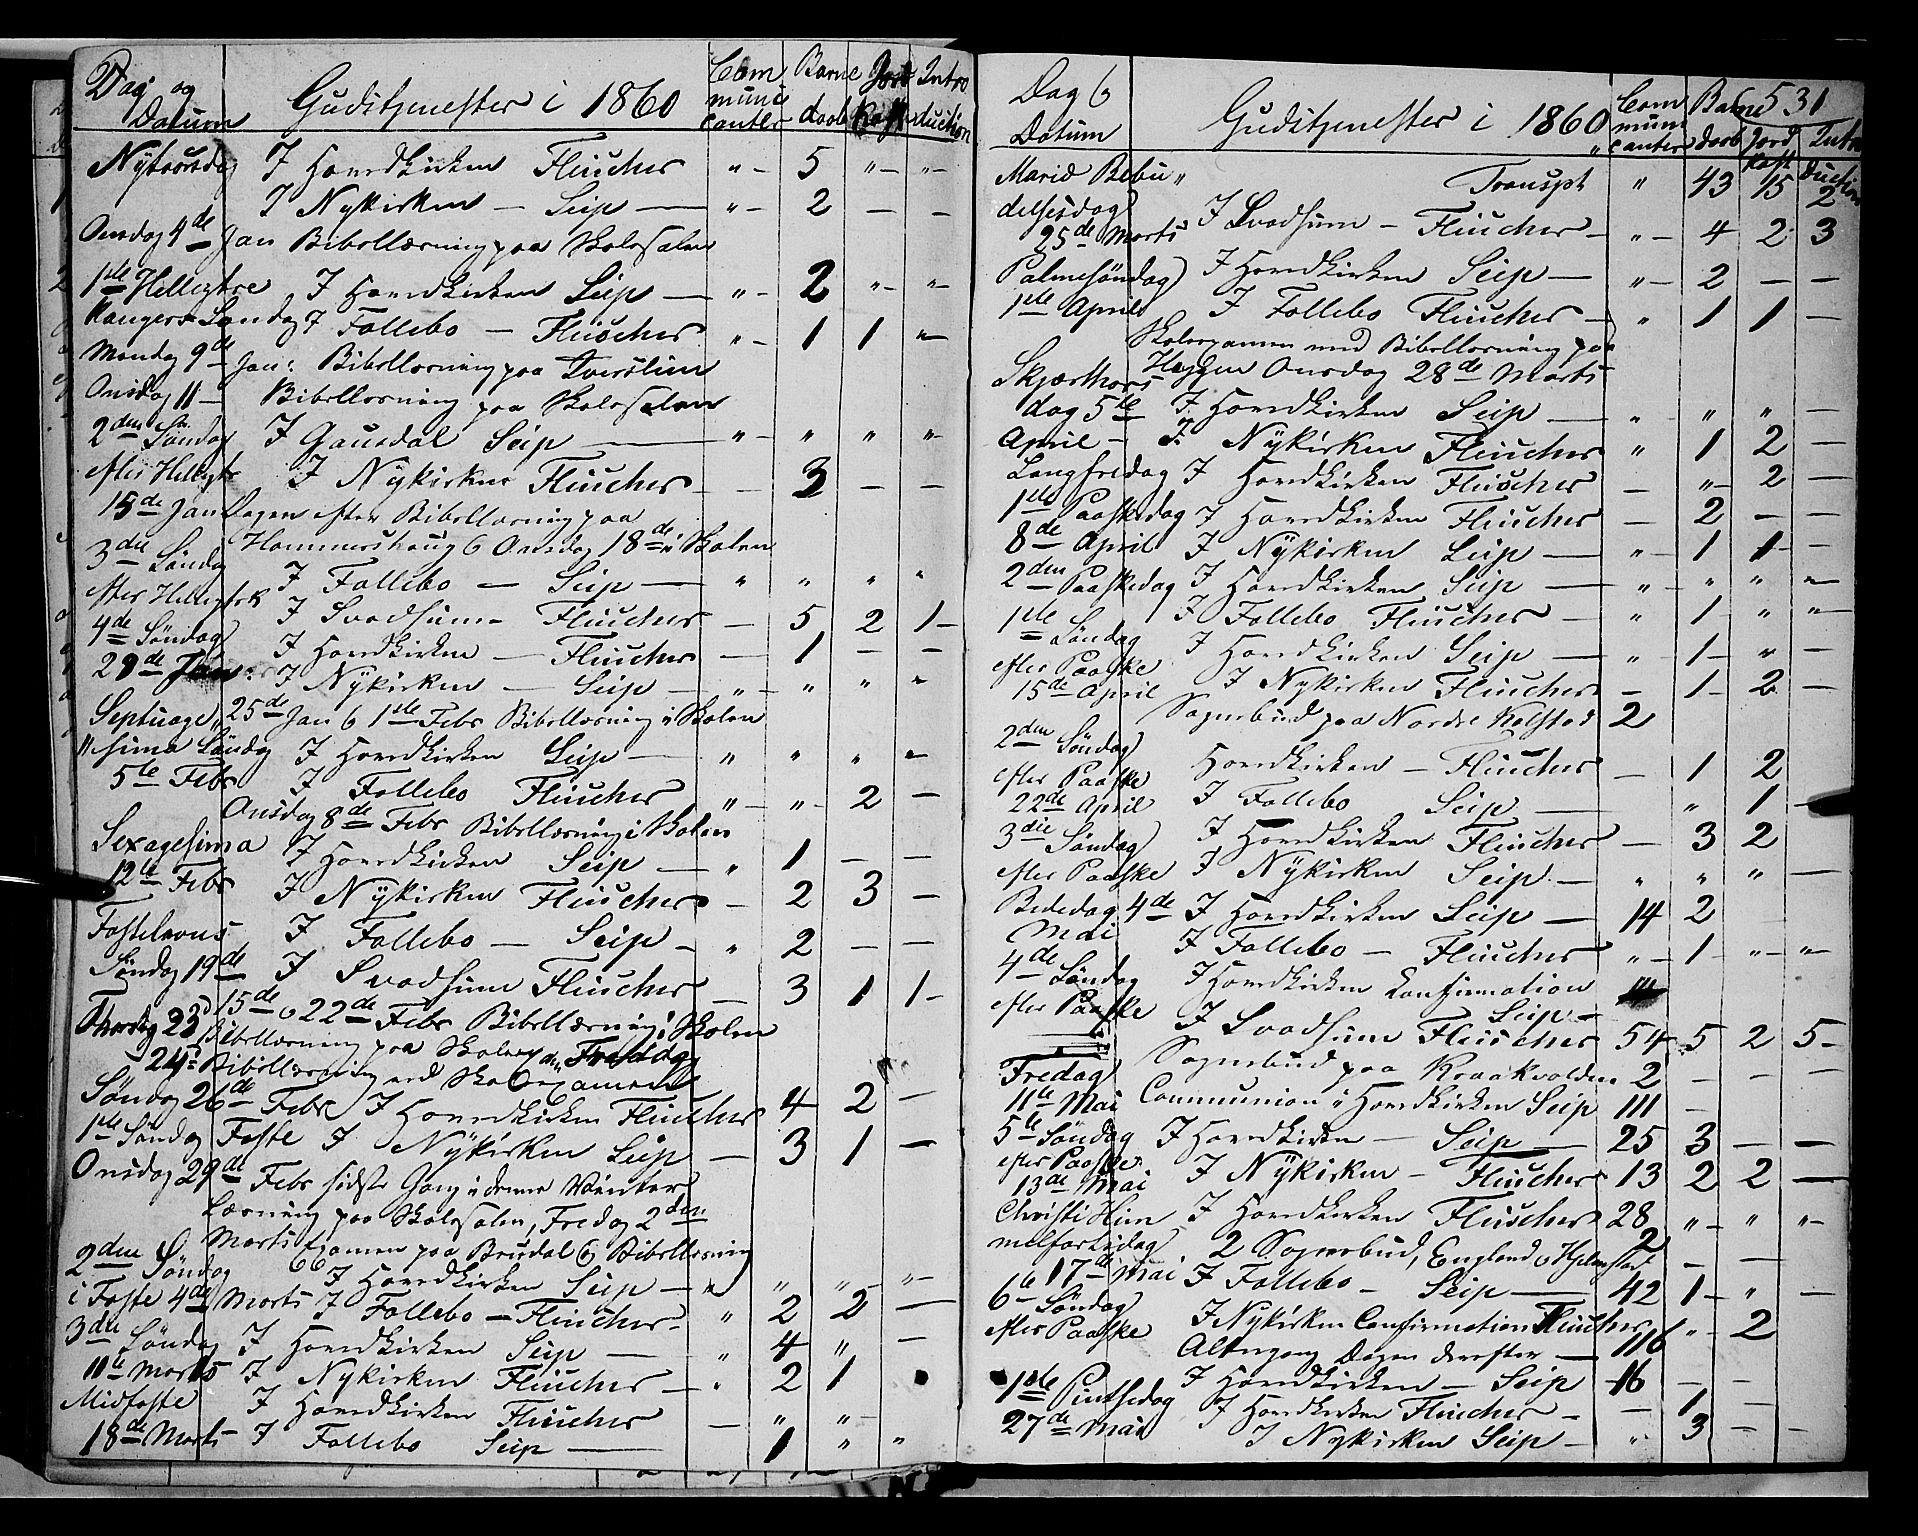 SAH, Gausdal prestekontor, Ministerialbok nr. 8, 1850-1861, s. 531